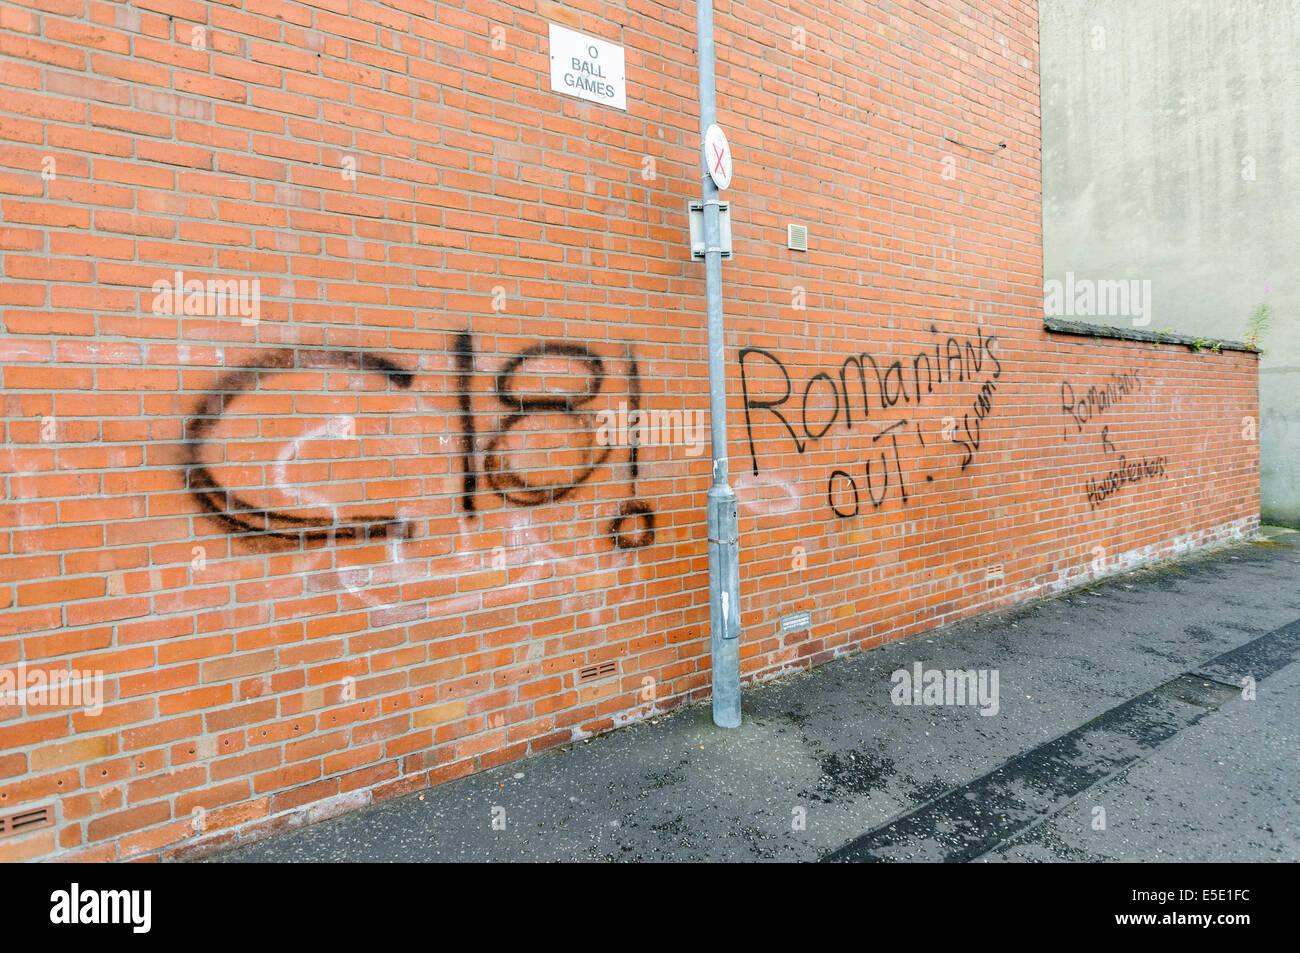 Belfast, Northern Ireland. 29th July, 2014. Graffiti saying 'C18! Romanians Out! Scum.  Romanians R [sic] Housebreakers' - Stock Image